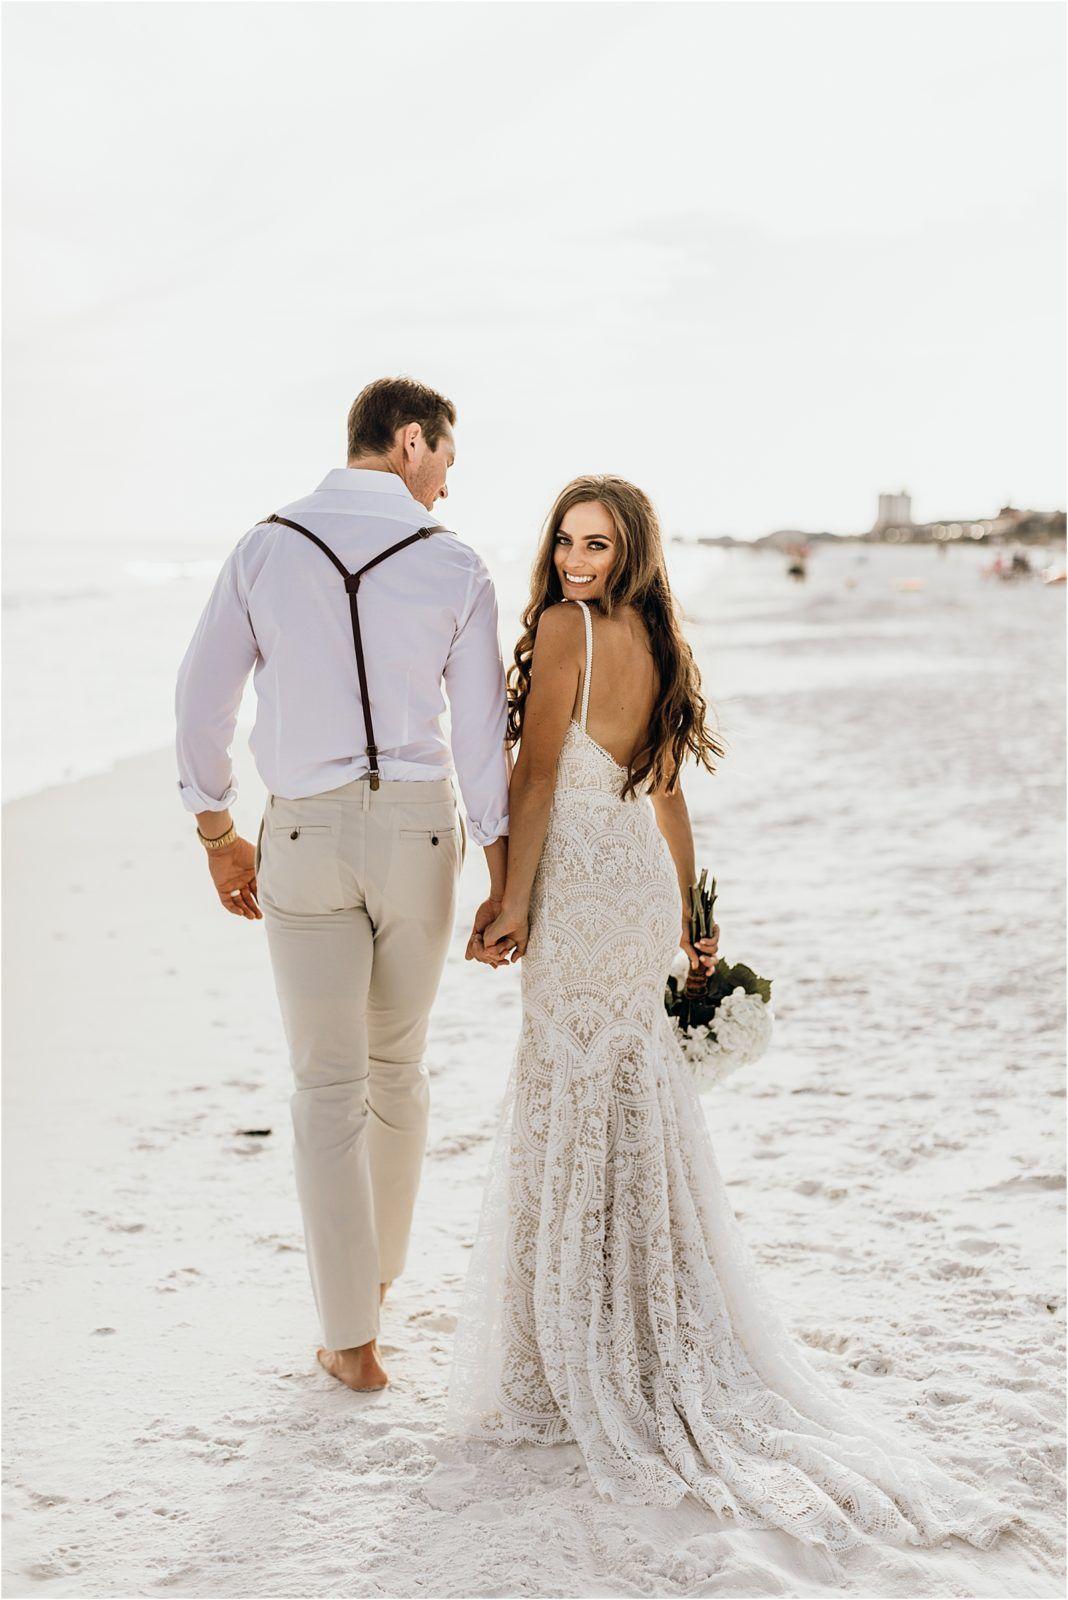 Lauren + Jon | Stones Throw Miramar, Florida Beach Destination Wedding | Love, Anneliese Photography – loveanneliese.com – mr. + mrs. haka